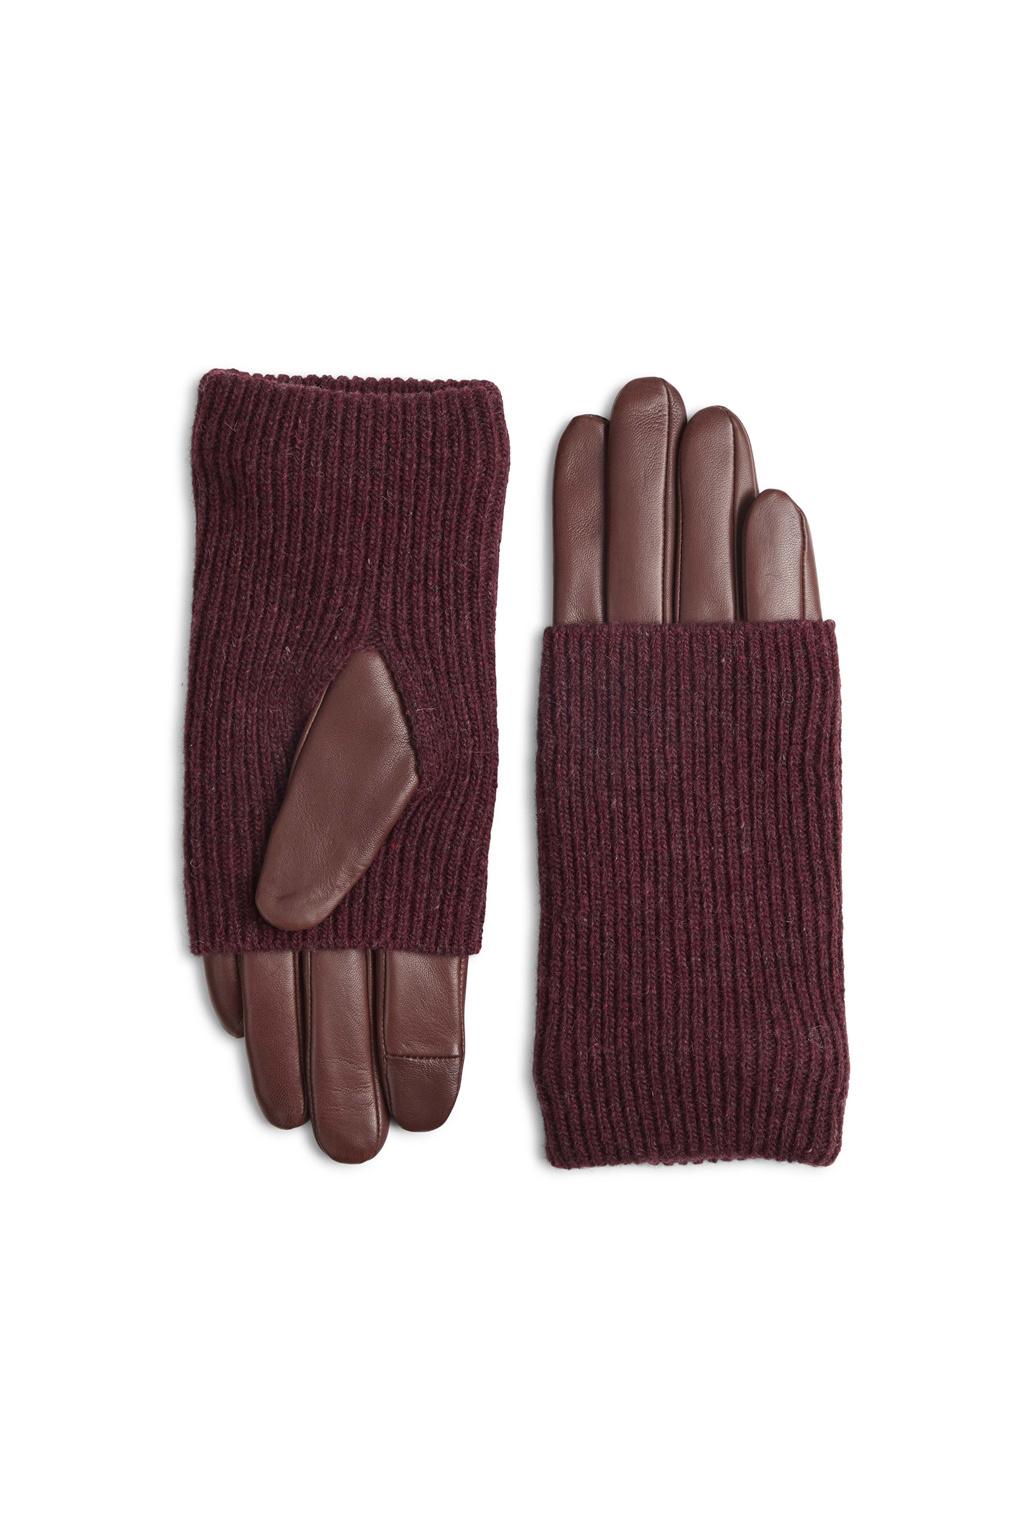 Helly Glove - Cognac w/ Burgundy-2